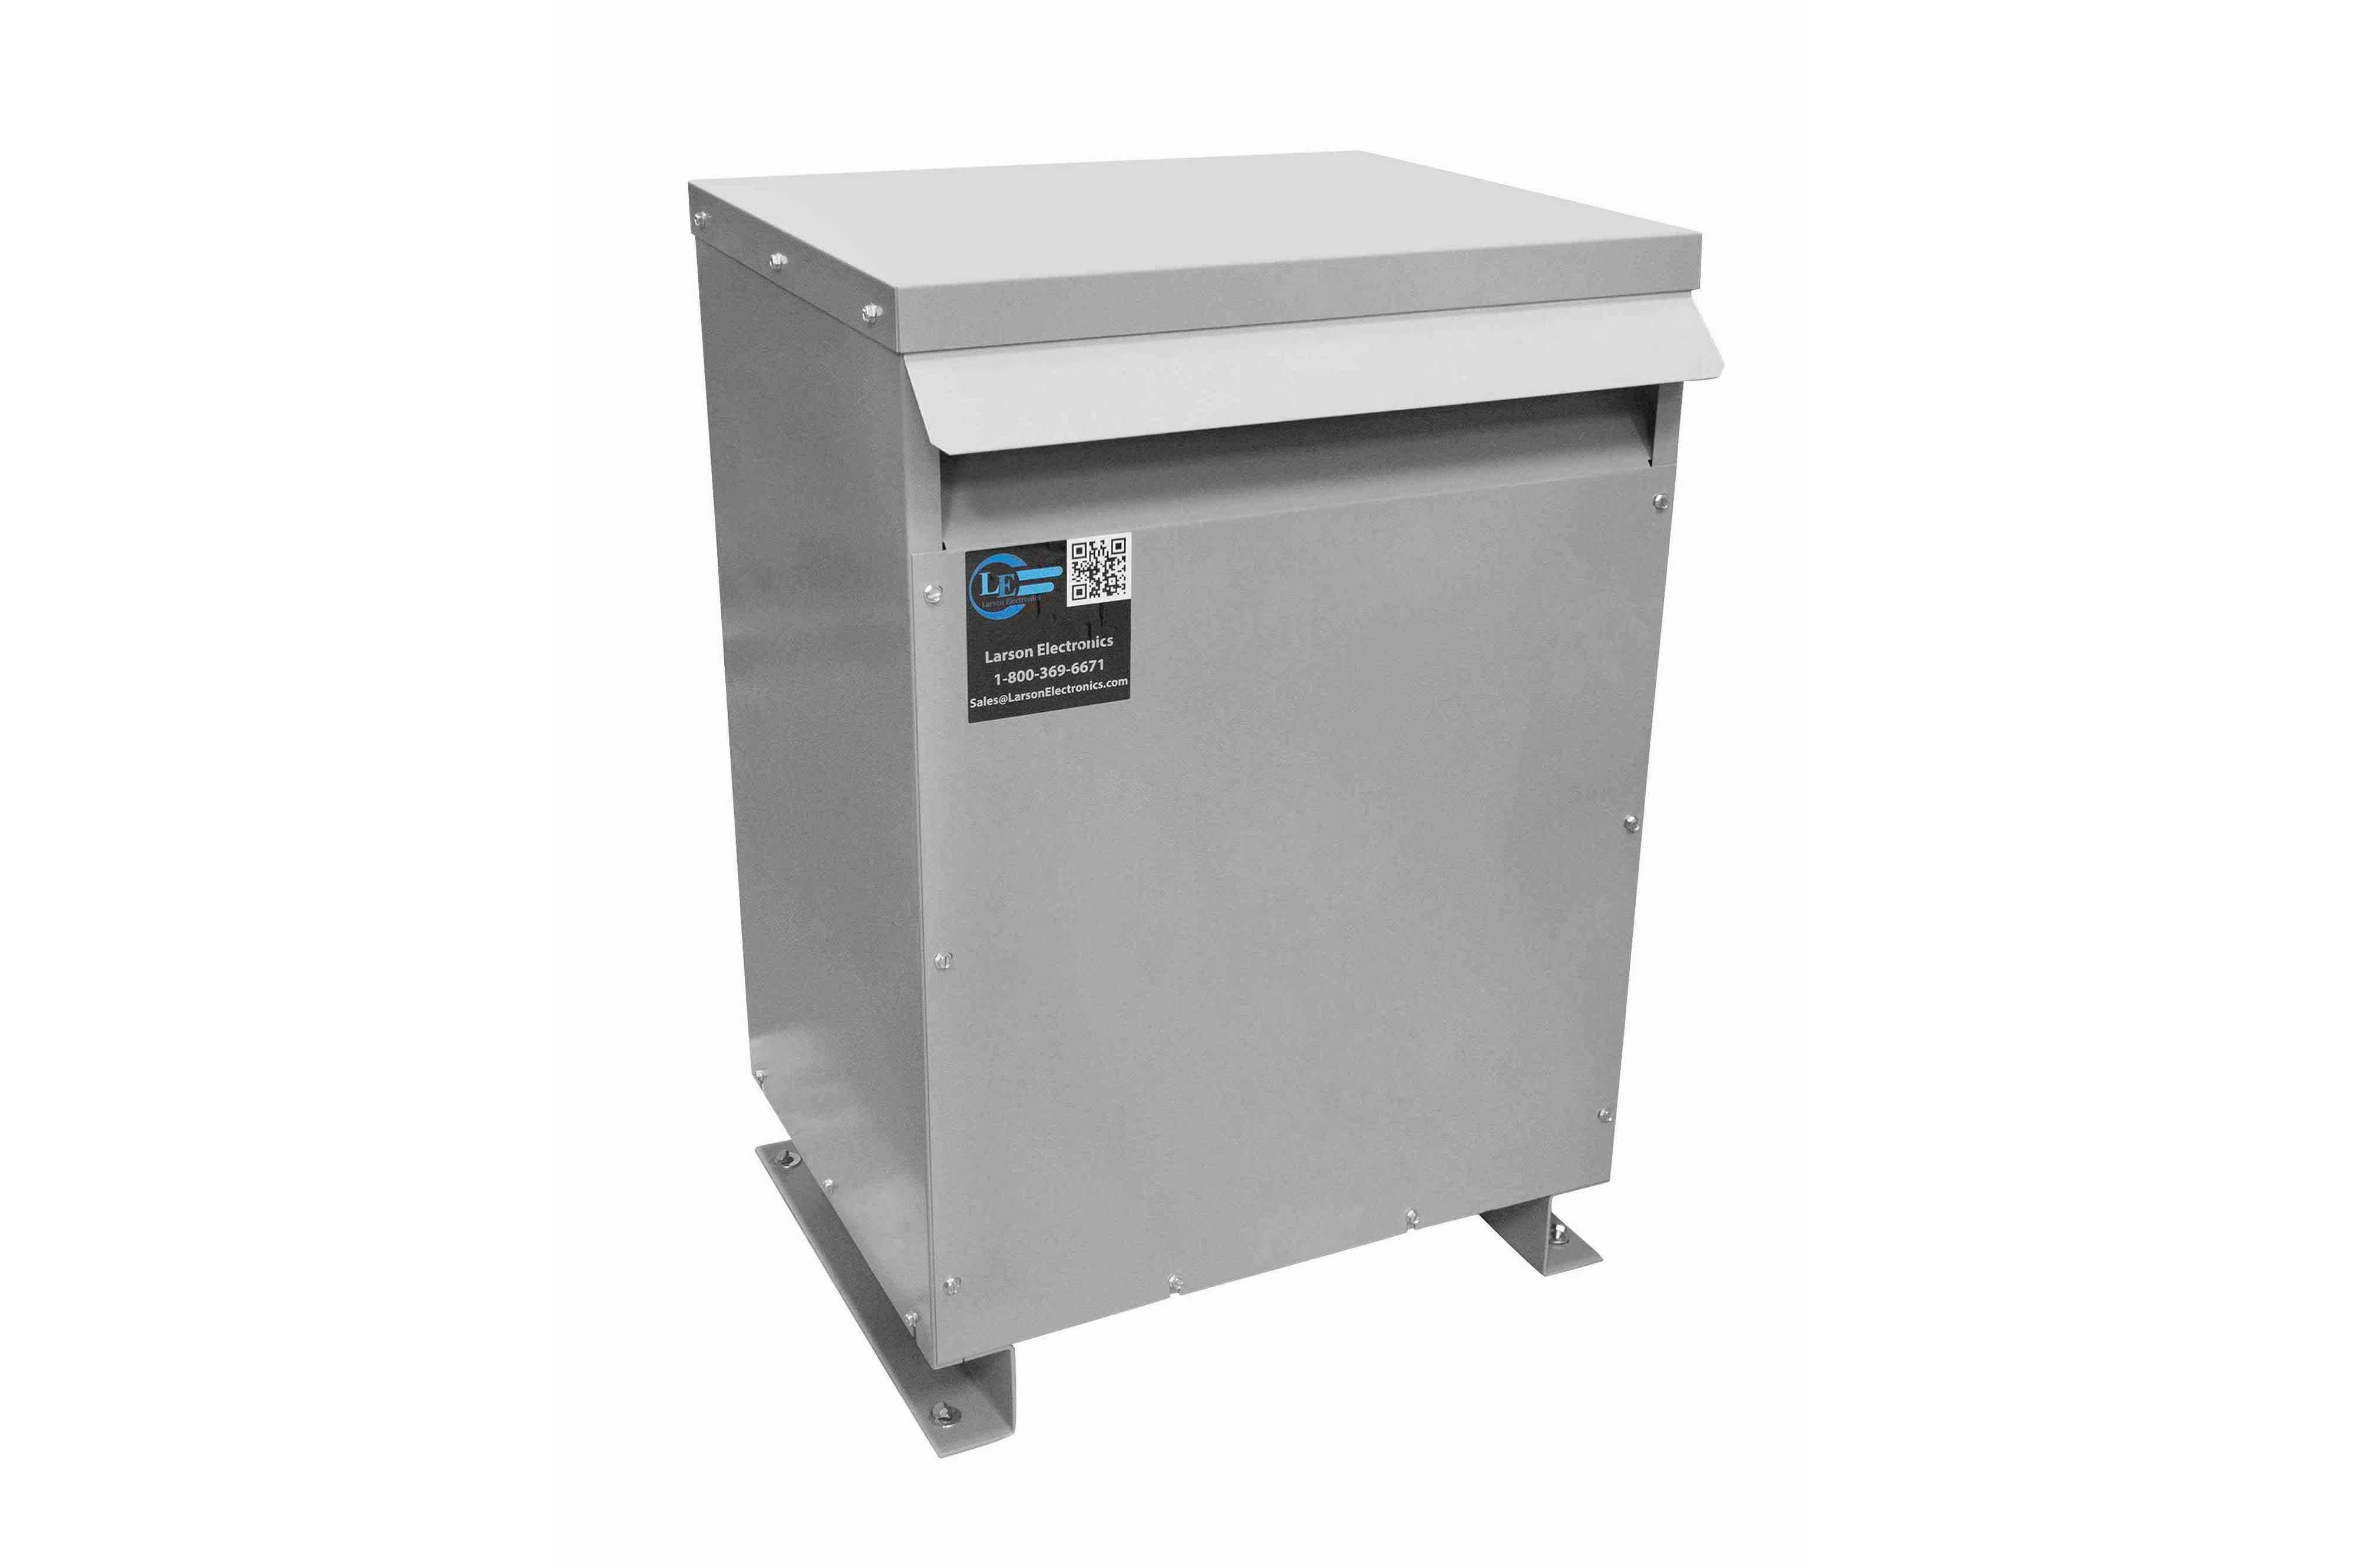 26 kVA 3PH Isolation Transformer, 575V Wye Primary, 400V Delta Secondary, N3R, Ventilated, 60 Hz